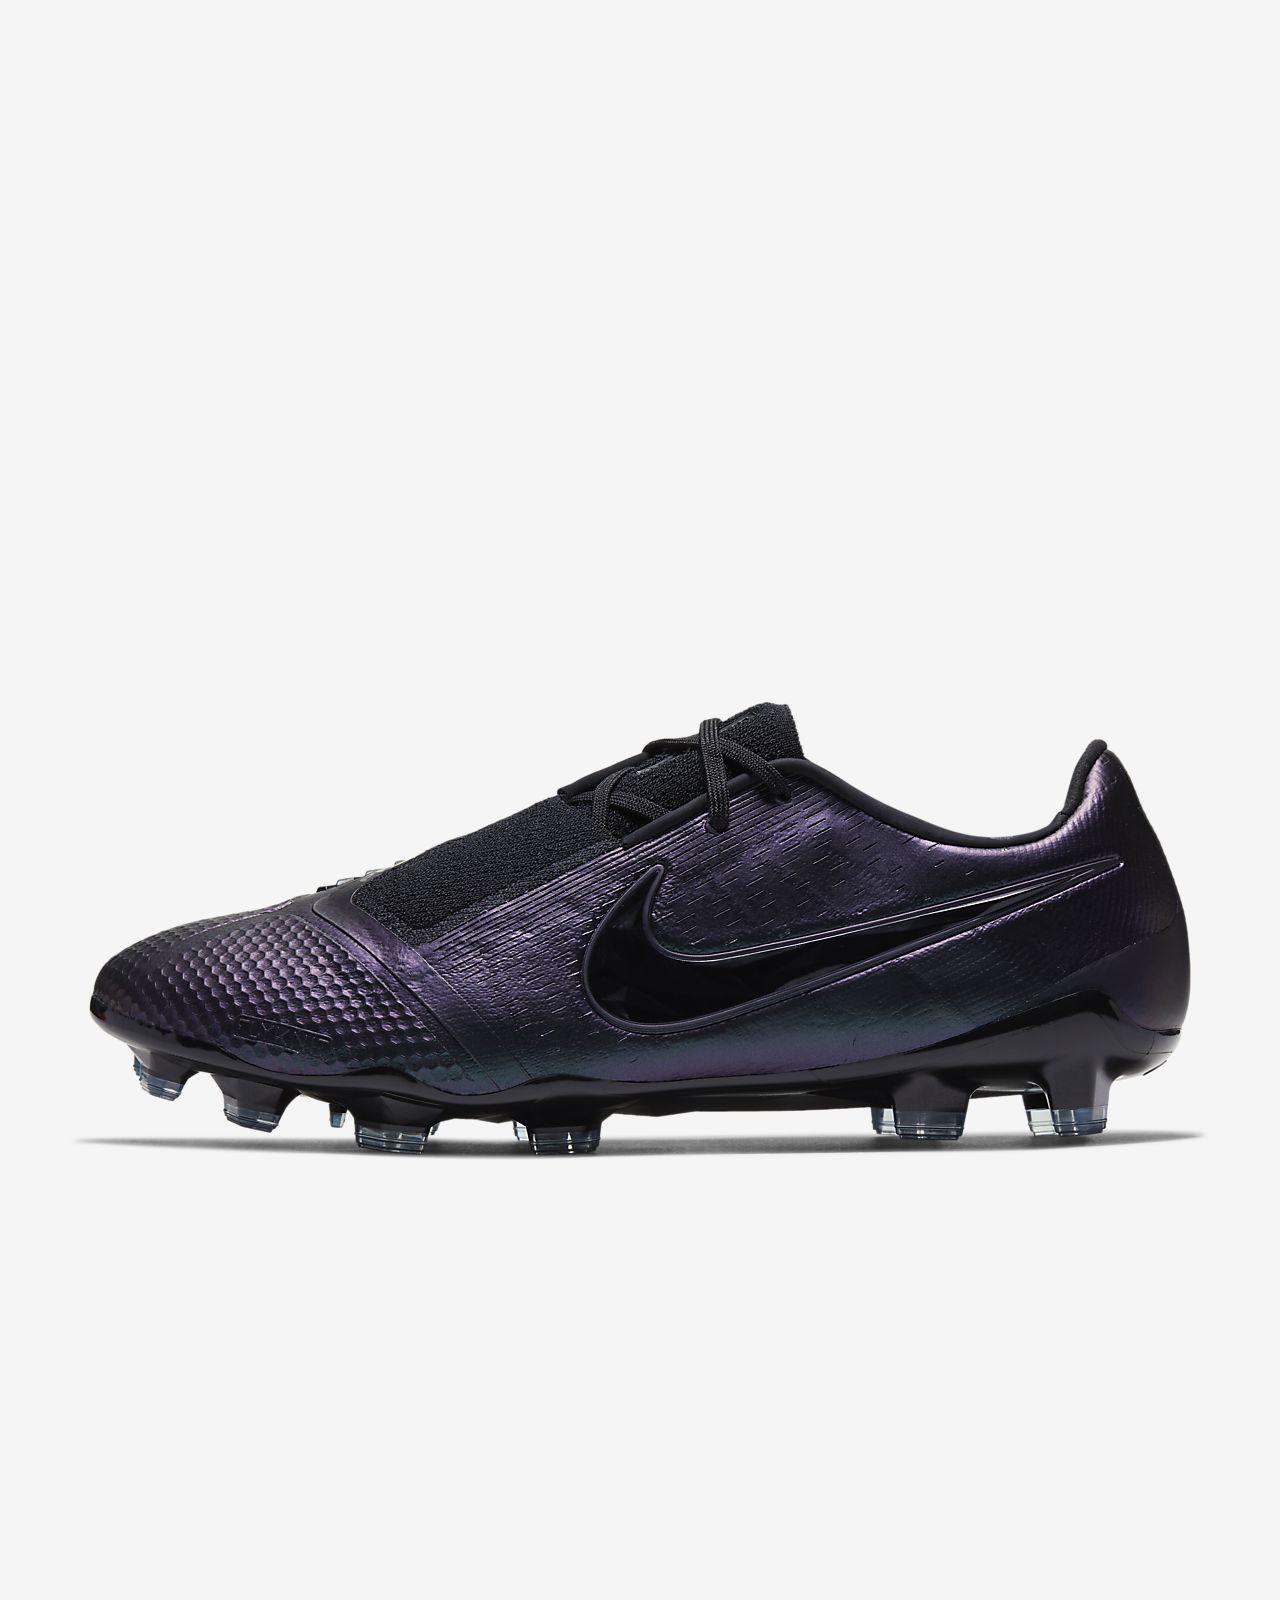 Nike Phantom Venom Elite FG Firm-Ground Football Boot